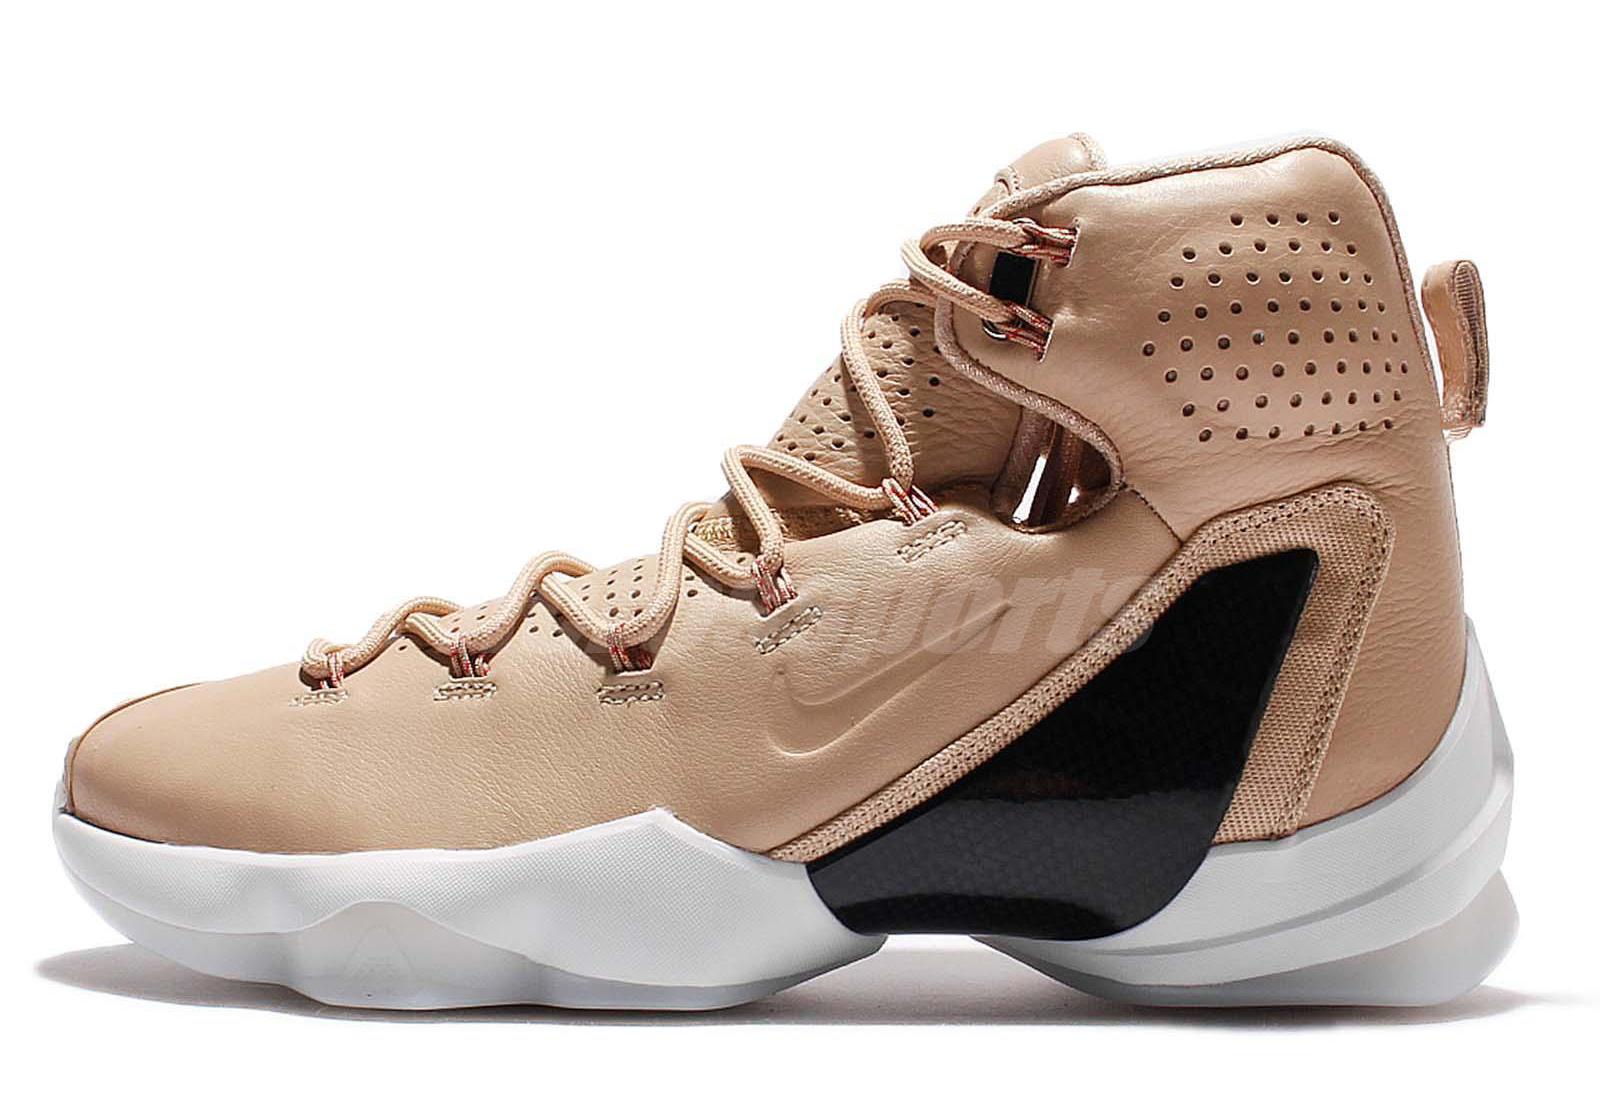 d5c6c707312 Nike LeBron 13 Elite EXT